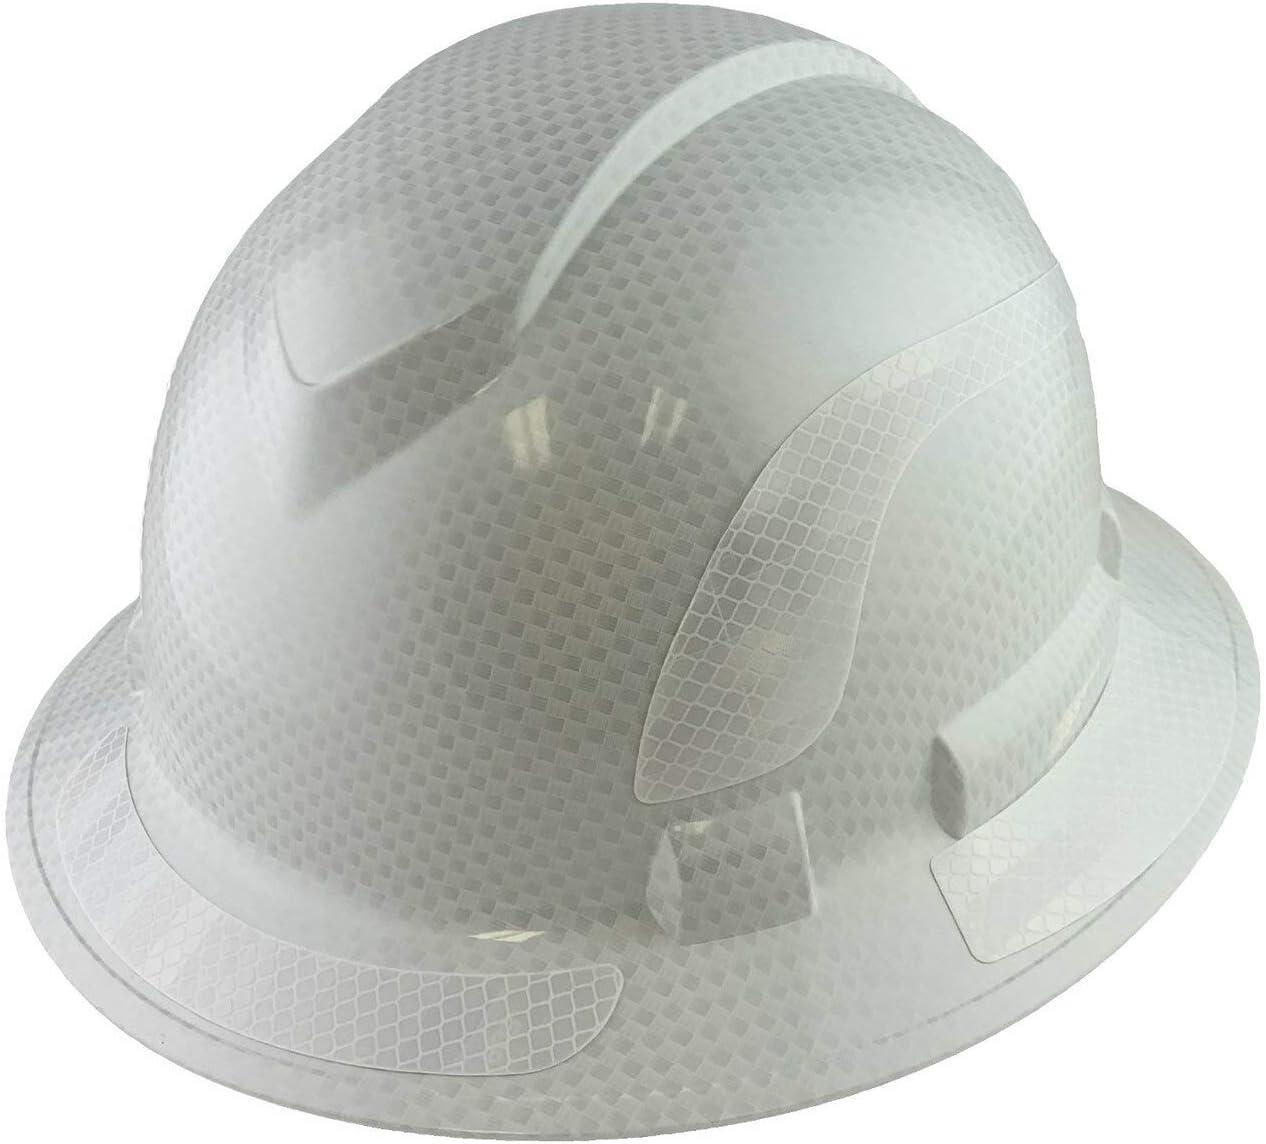 Ridgeline Full Brim New products, world's highest quality popular! Graphite Patten Hard Hats Arlington Mall Hi Reflective with